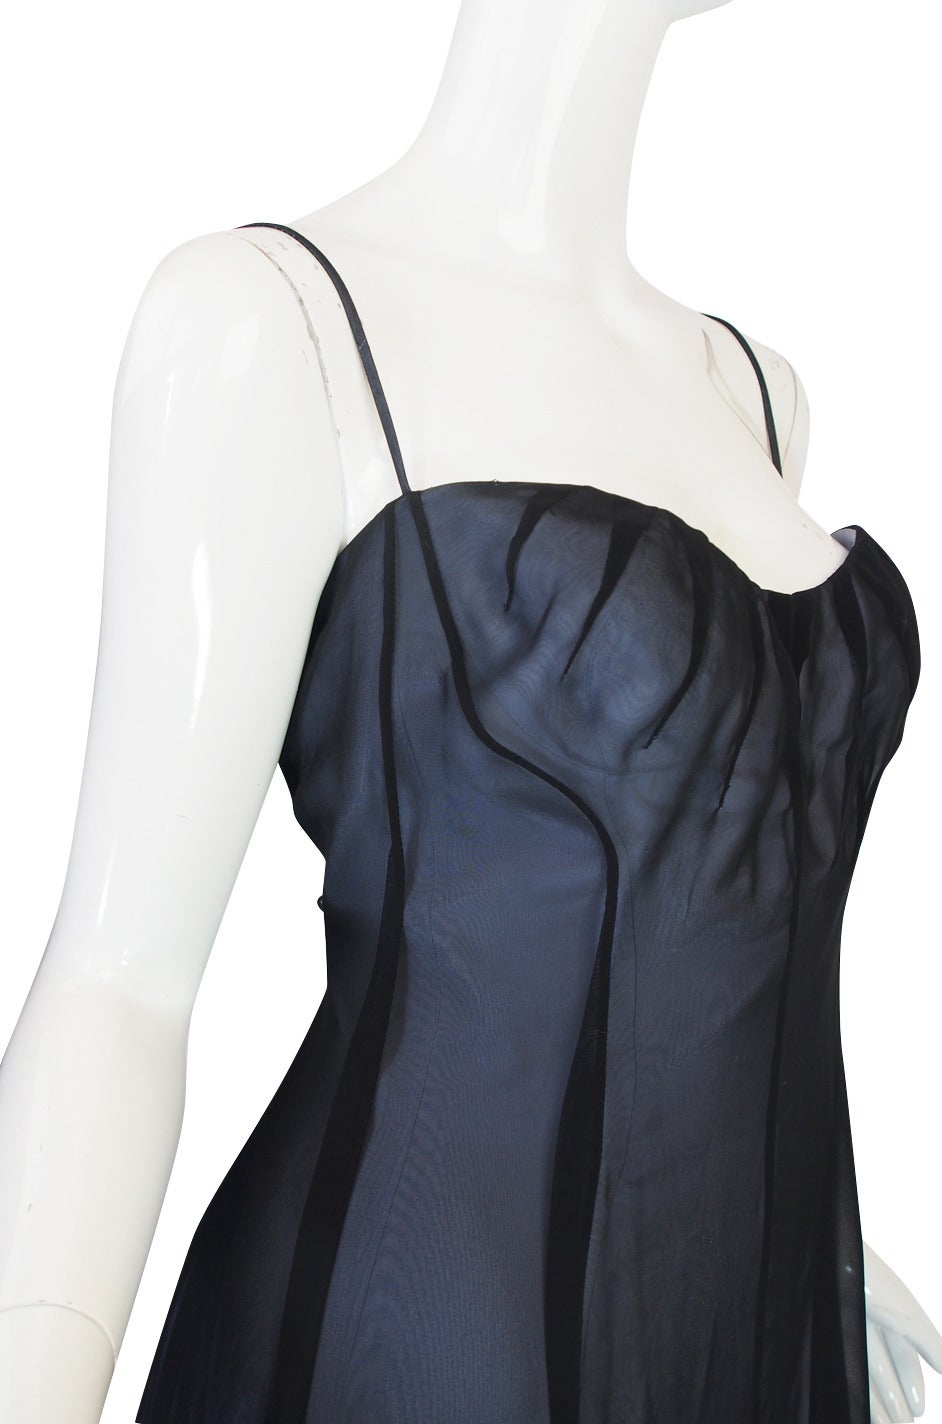 1990s Thierry Mugler Sheer Silk Chiffon Dress 7